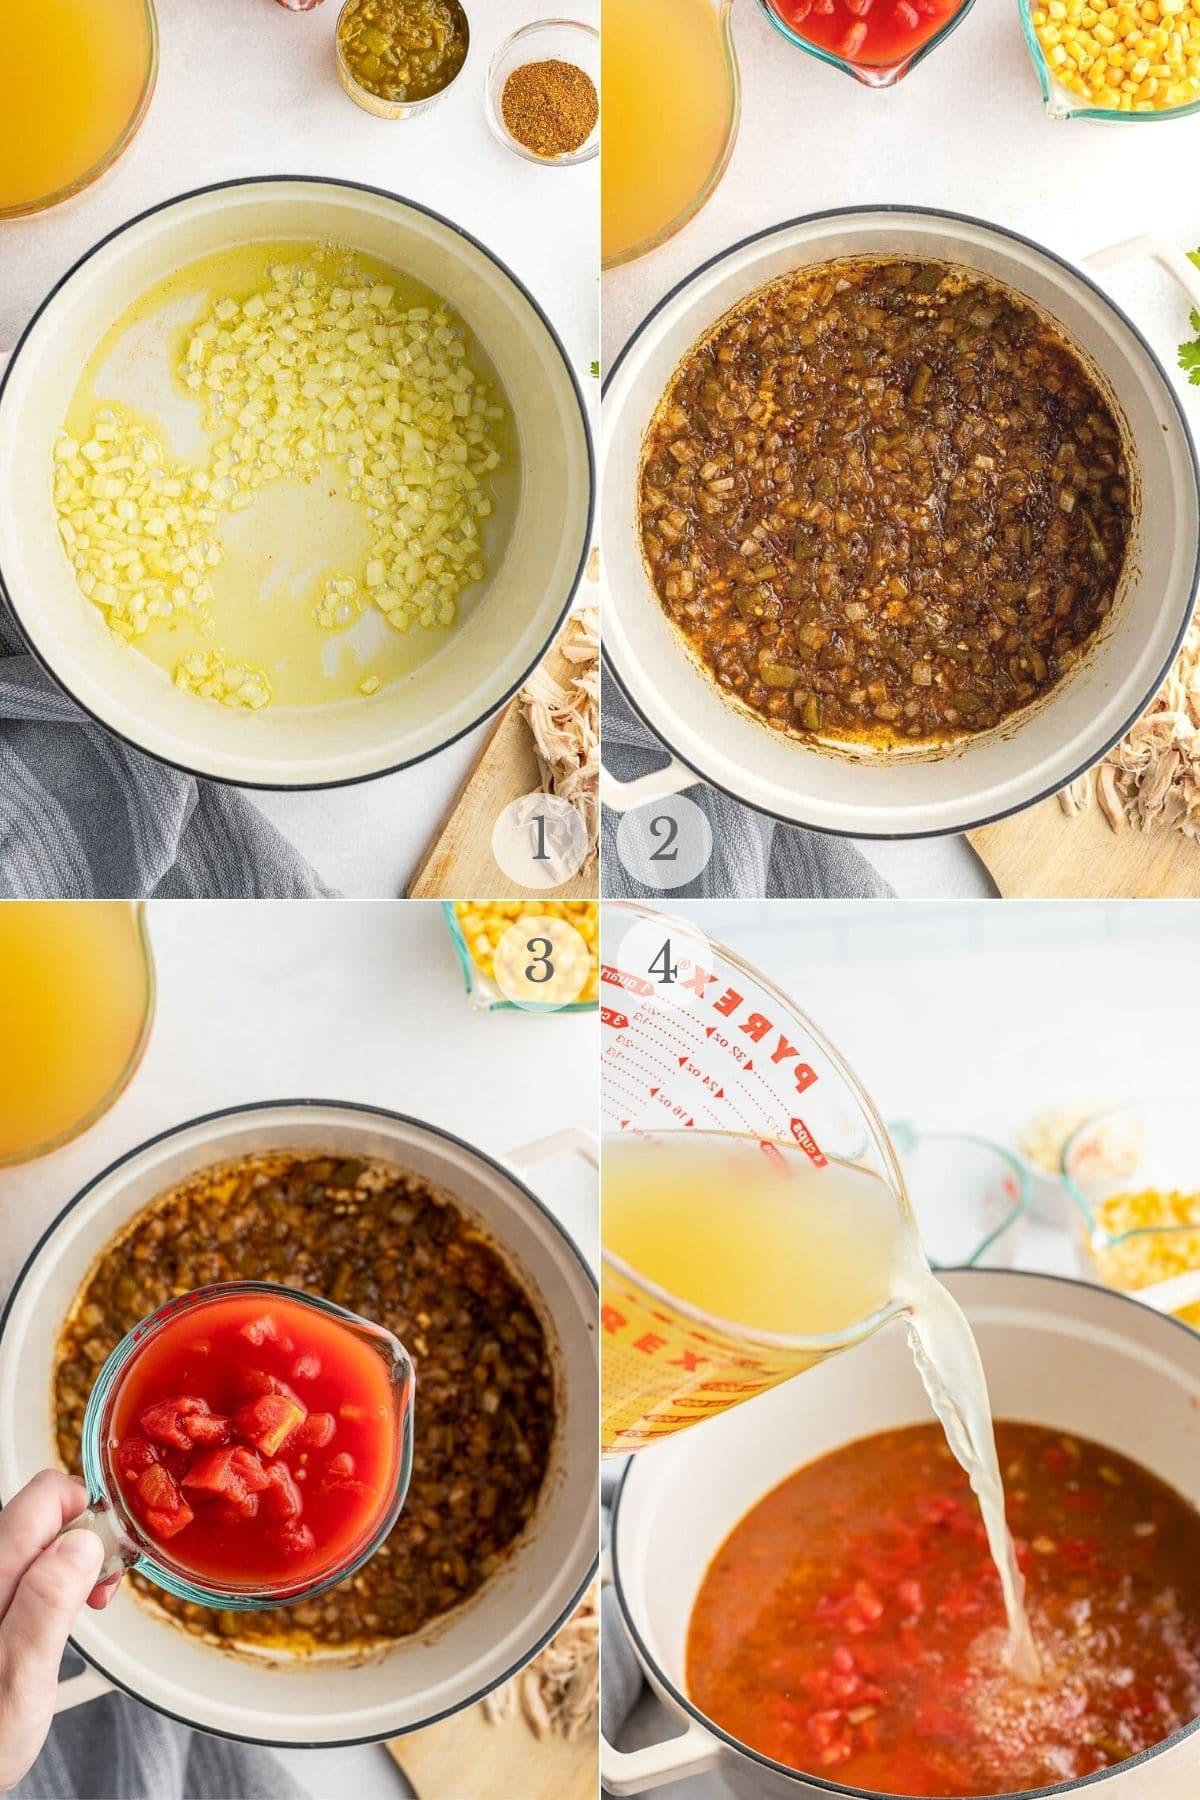 chicken tortilla soup recipes steps 1-4